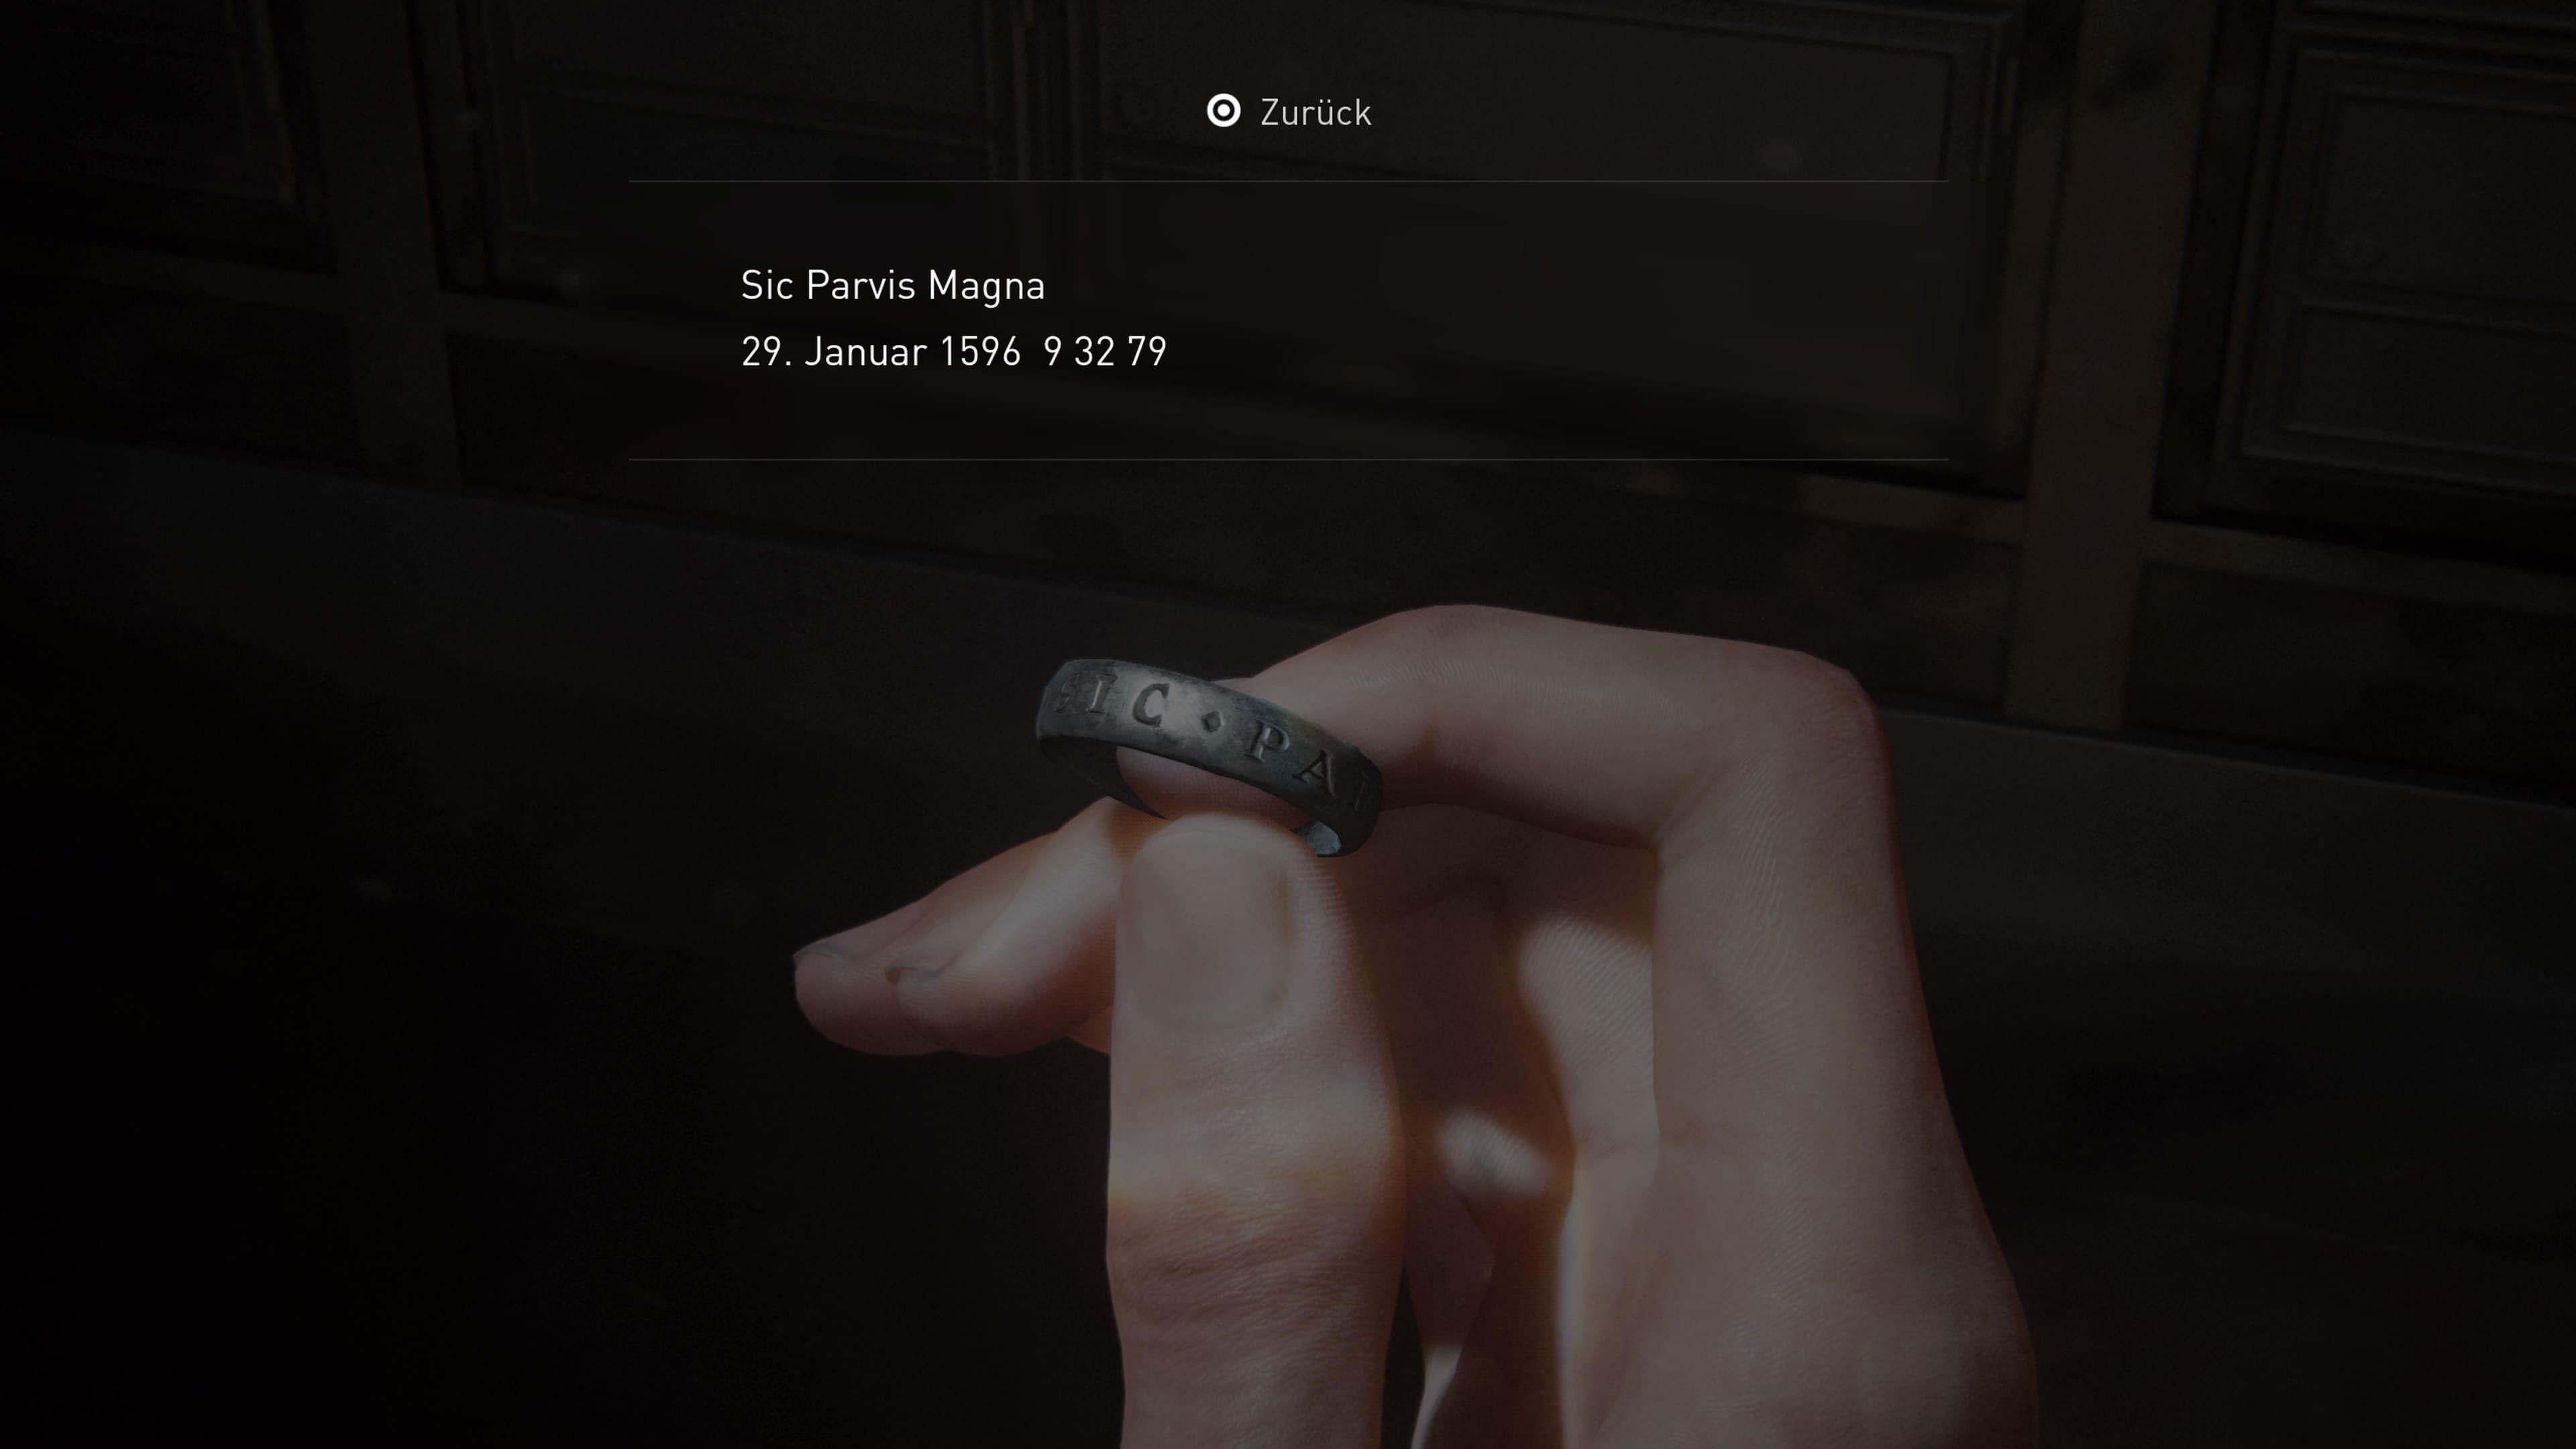 The Last of Us 2 - Antiker Ring